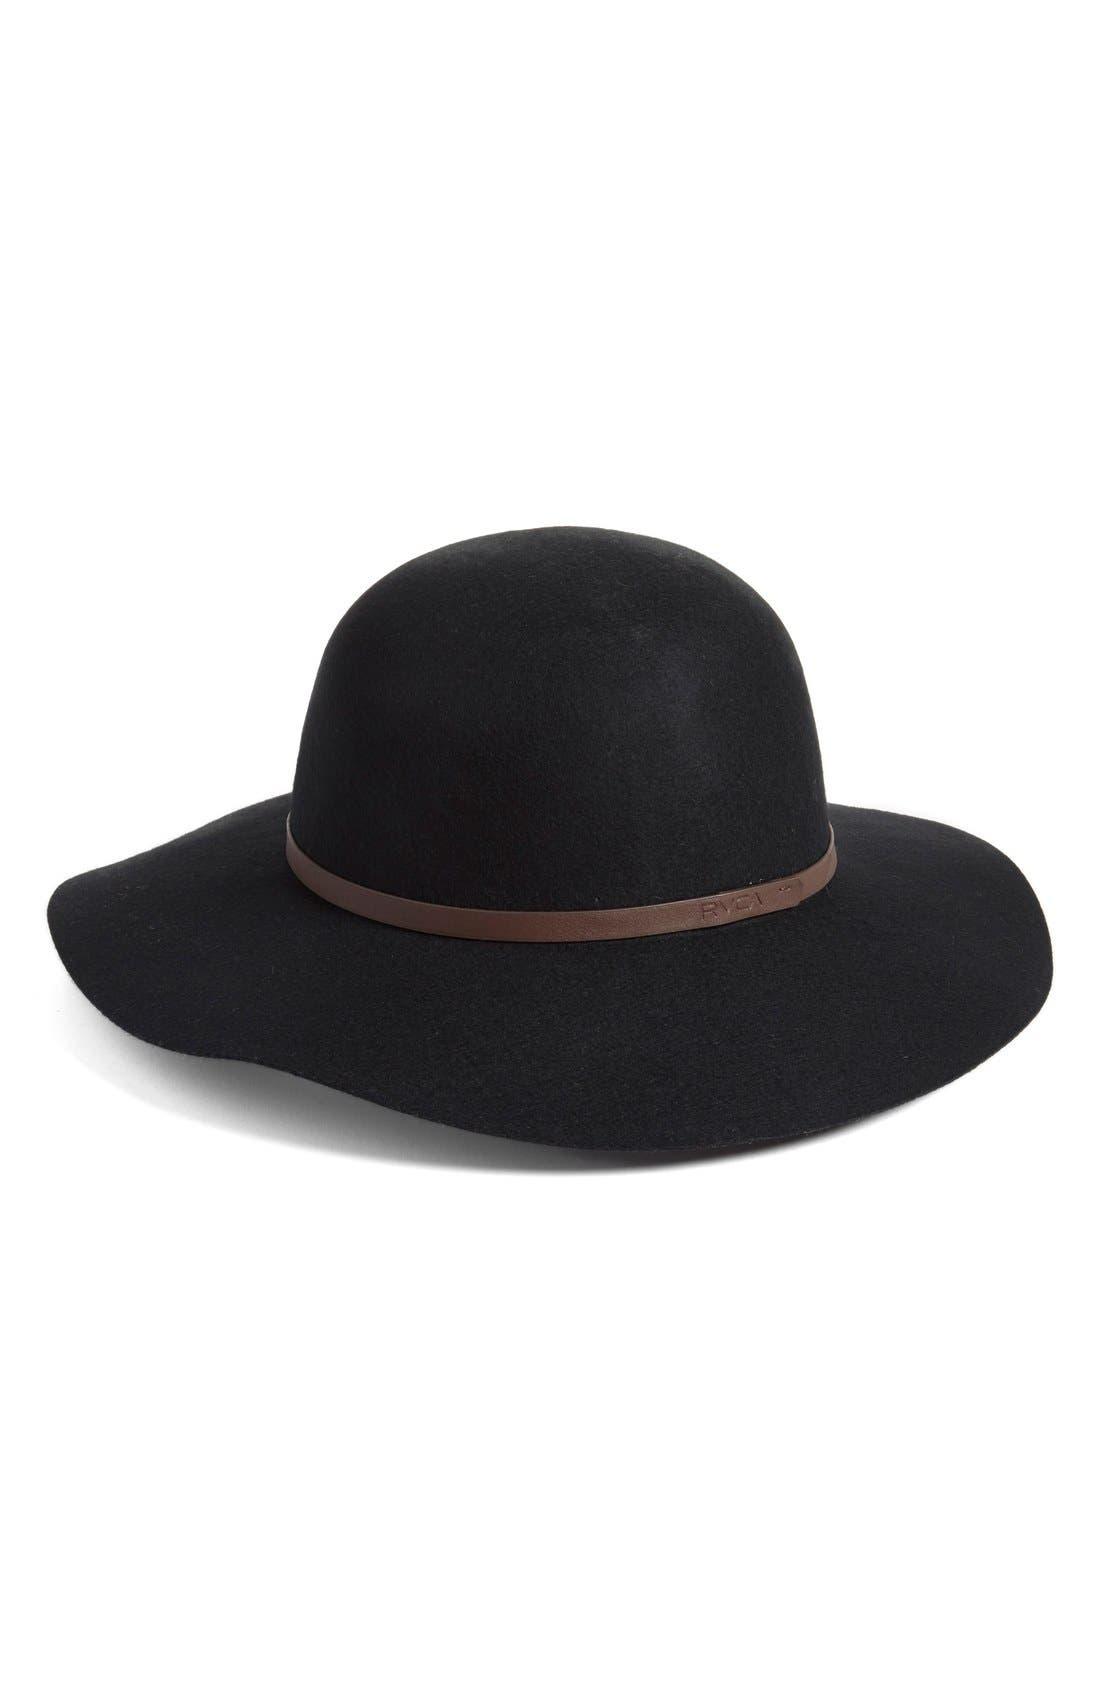 Main Image - RVCA 'Sunner' Wool Hat